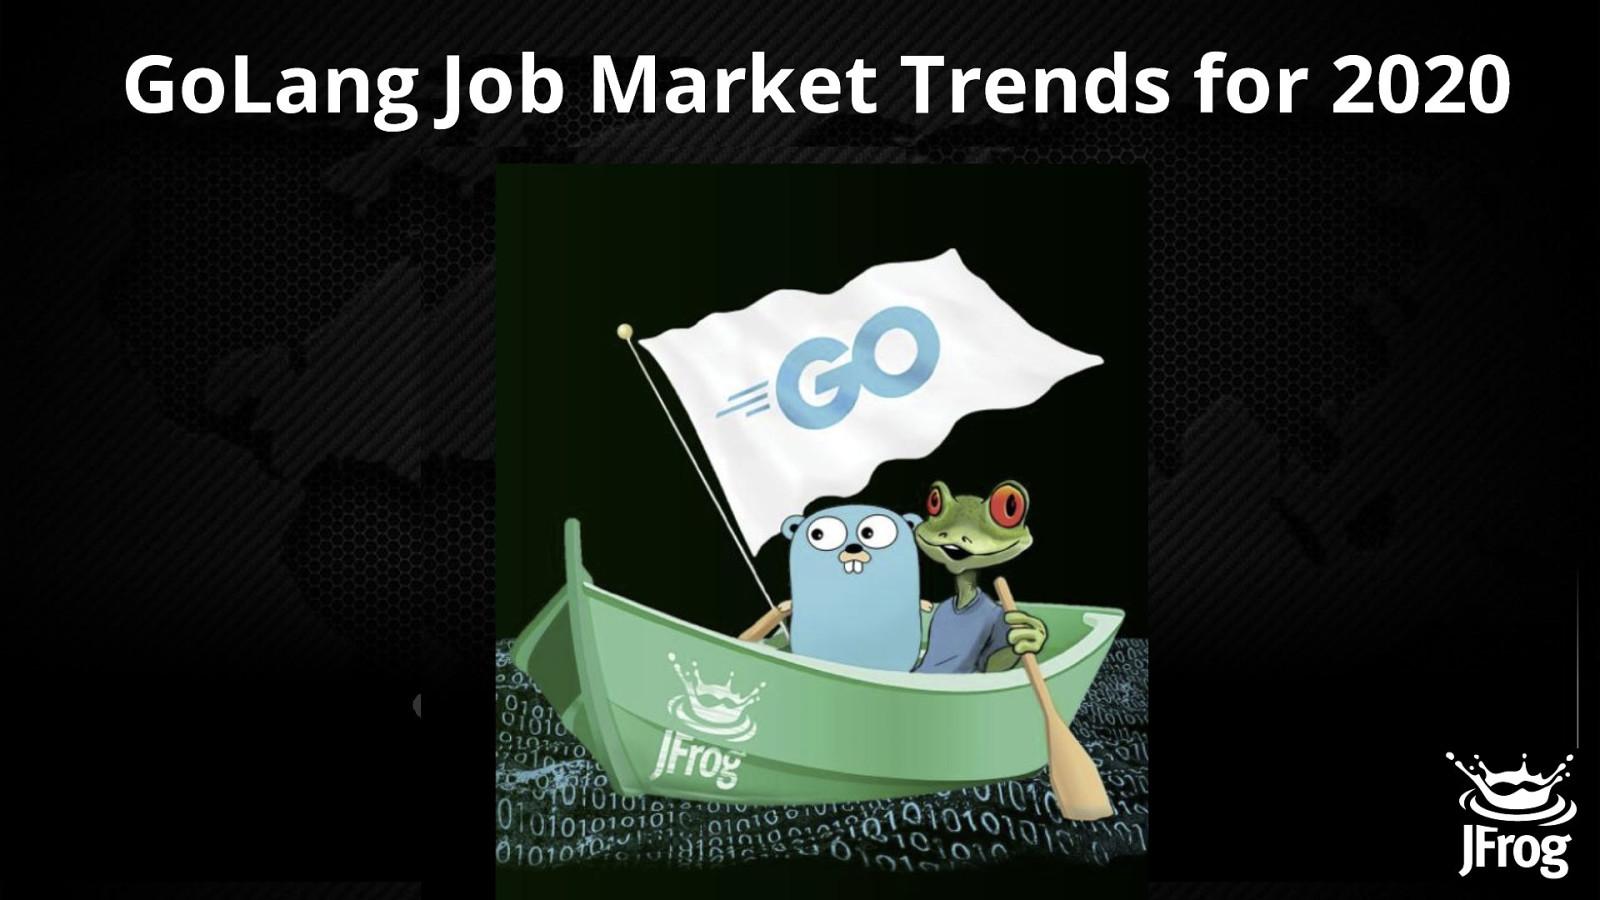 GoLang Job Market Trends for 2020